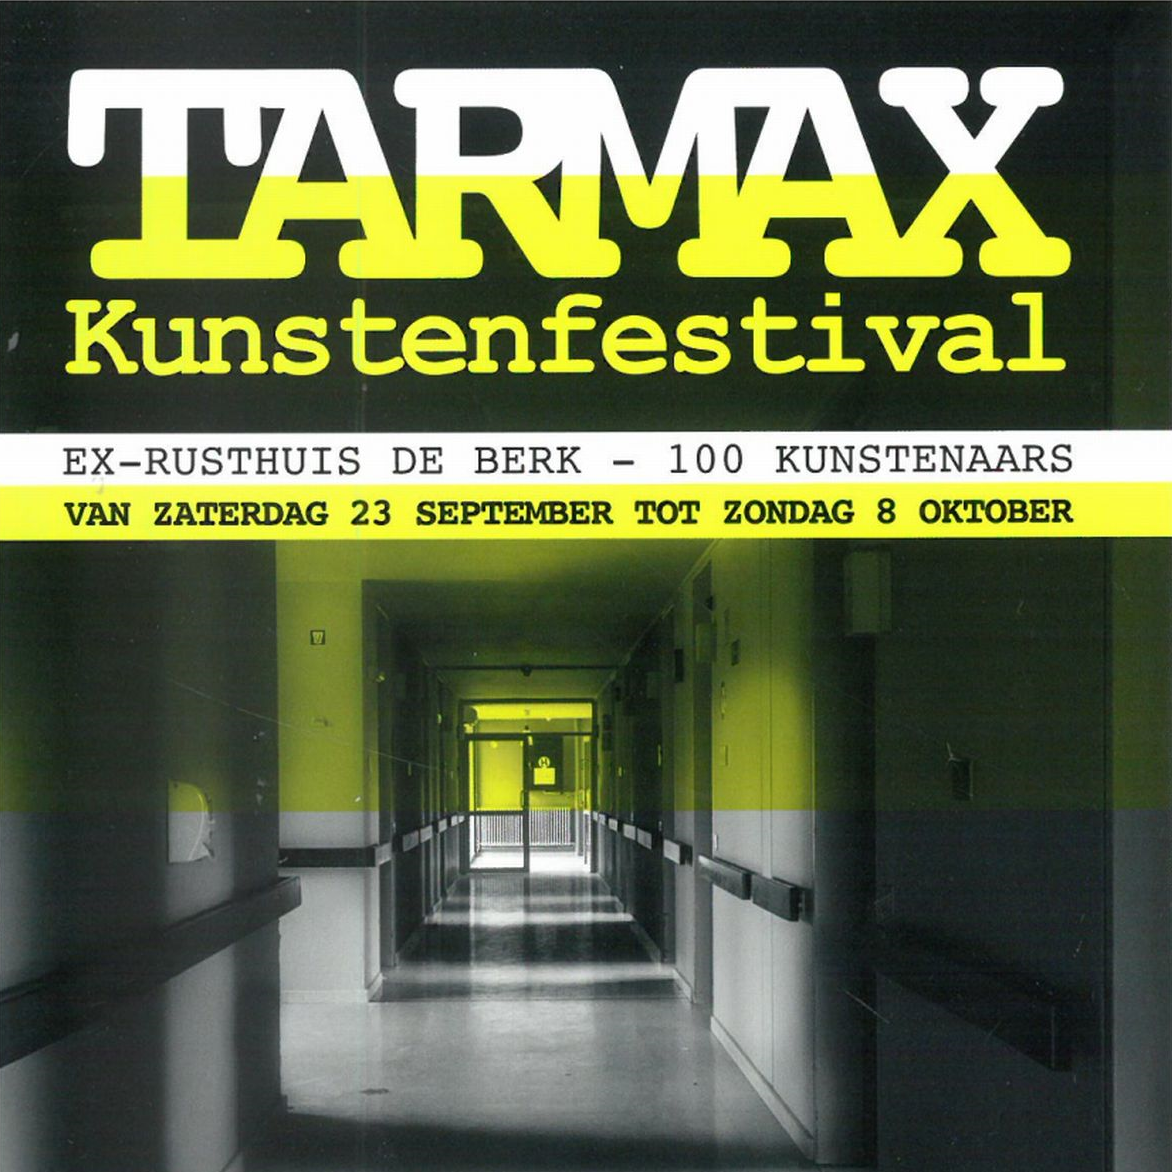 TarmaX Kunstenfestival 2017